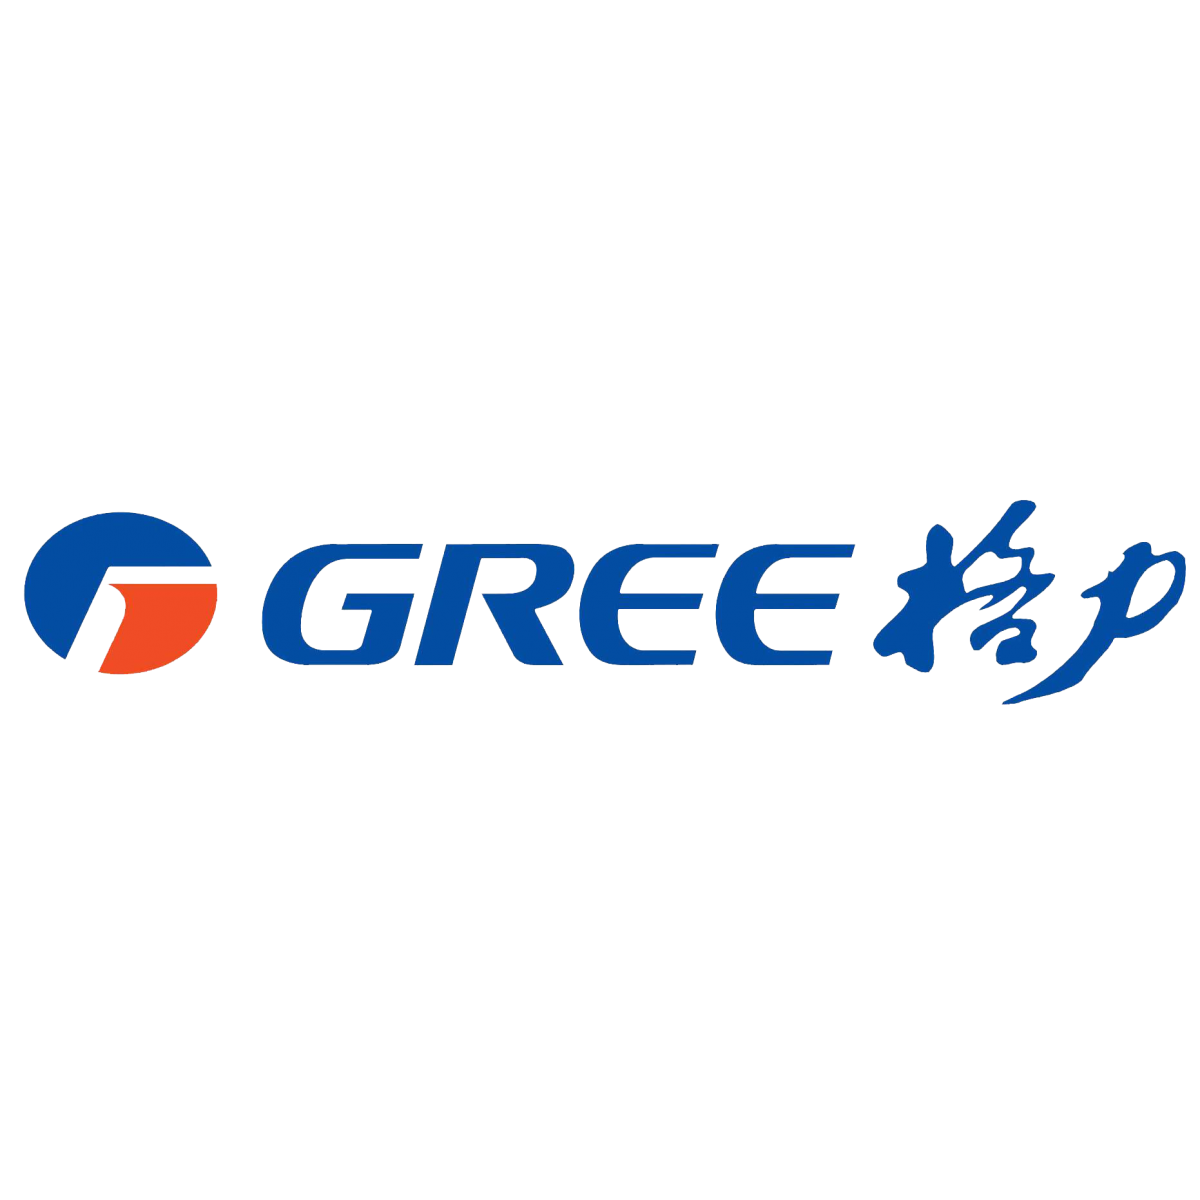 格力logo.png